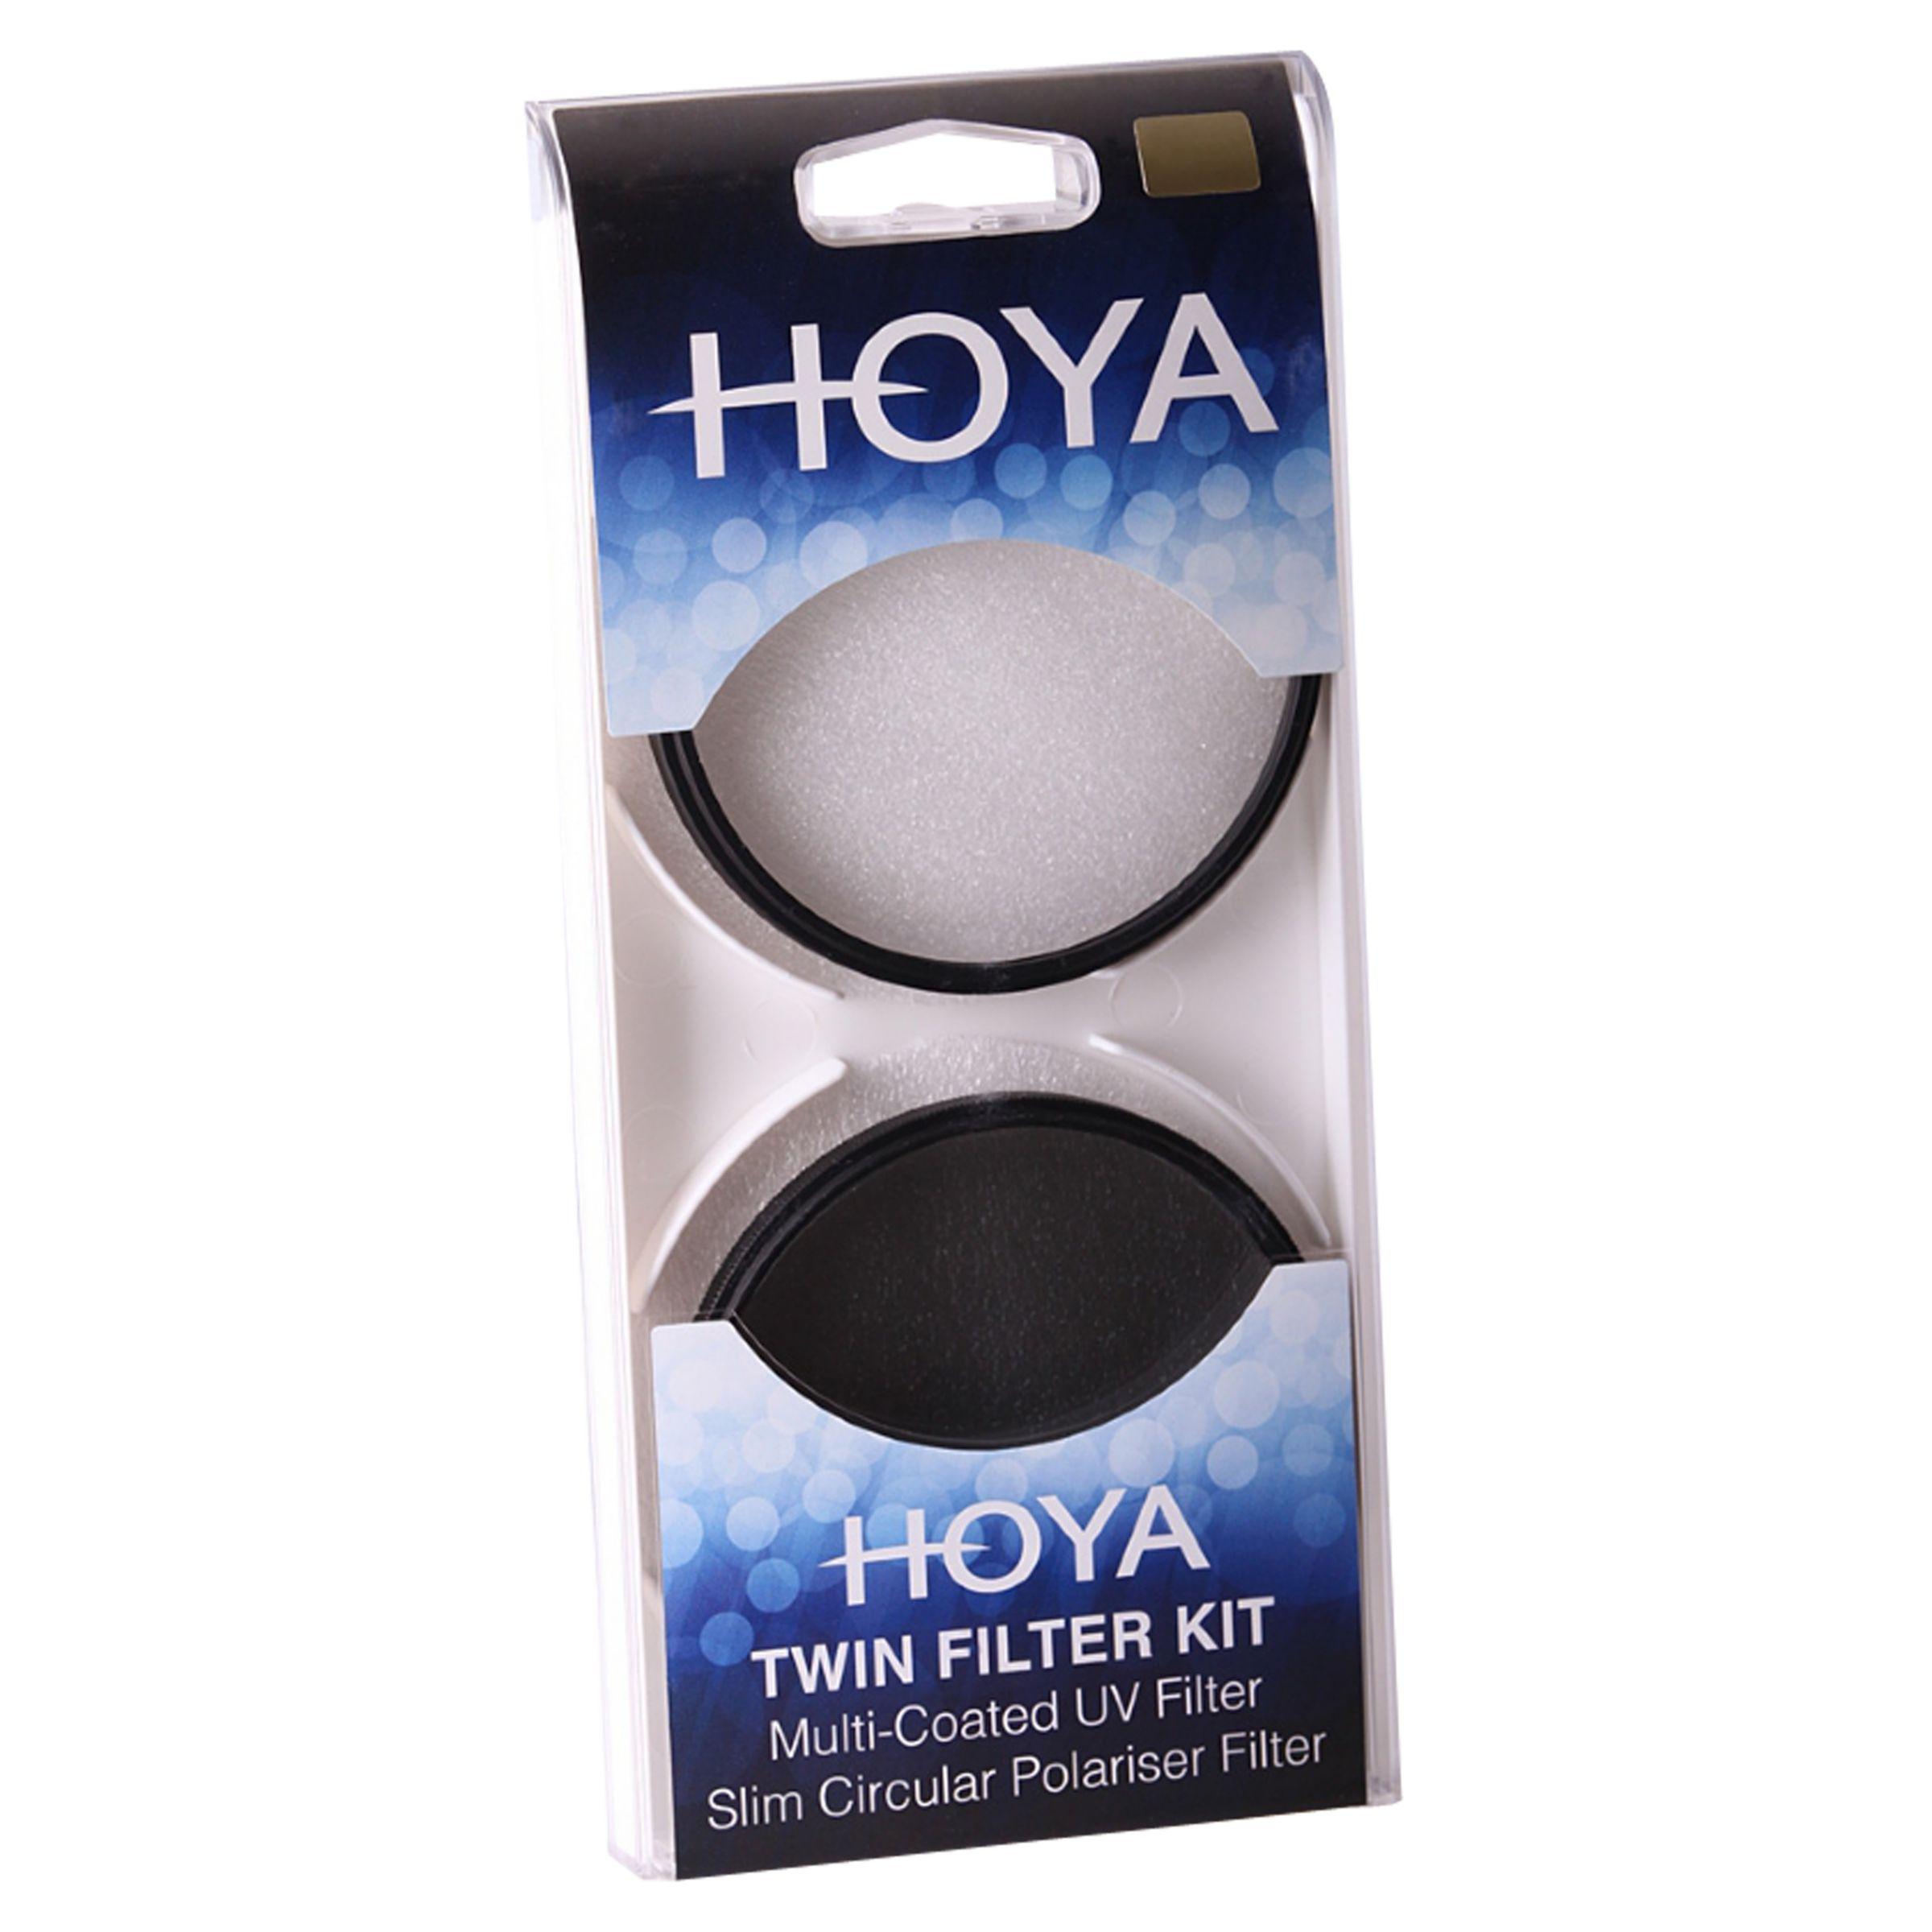 Hoya Hoya 58mm Twin Lens Filter Pack With UV & Circular Polariser Filter